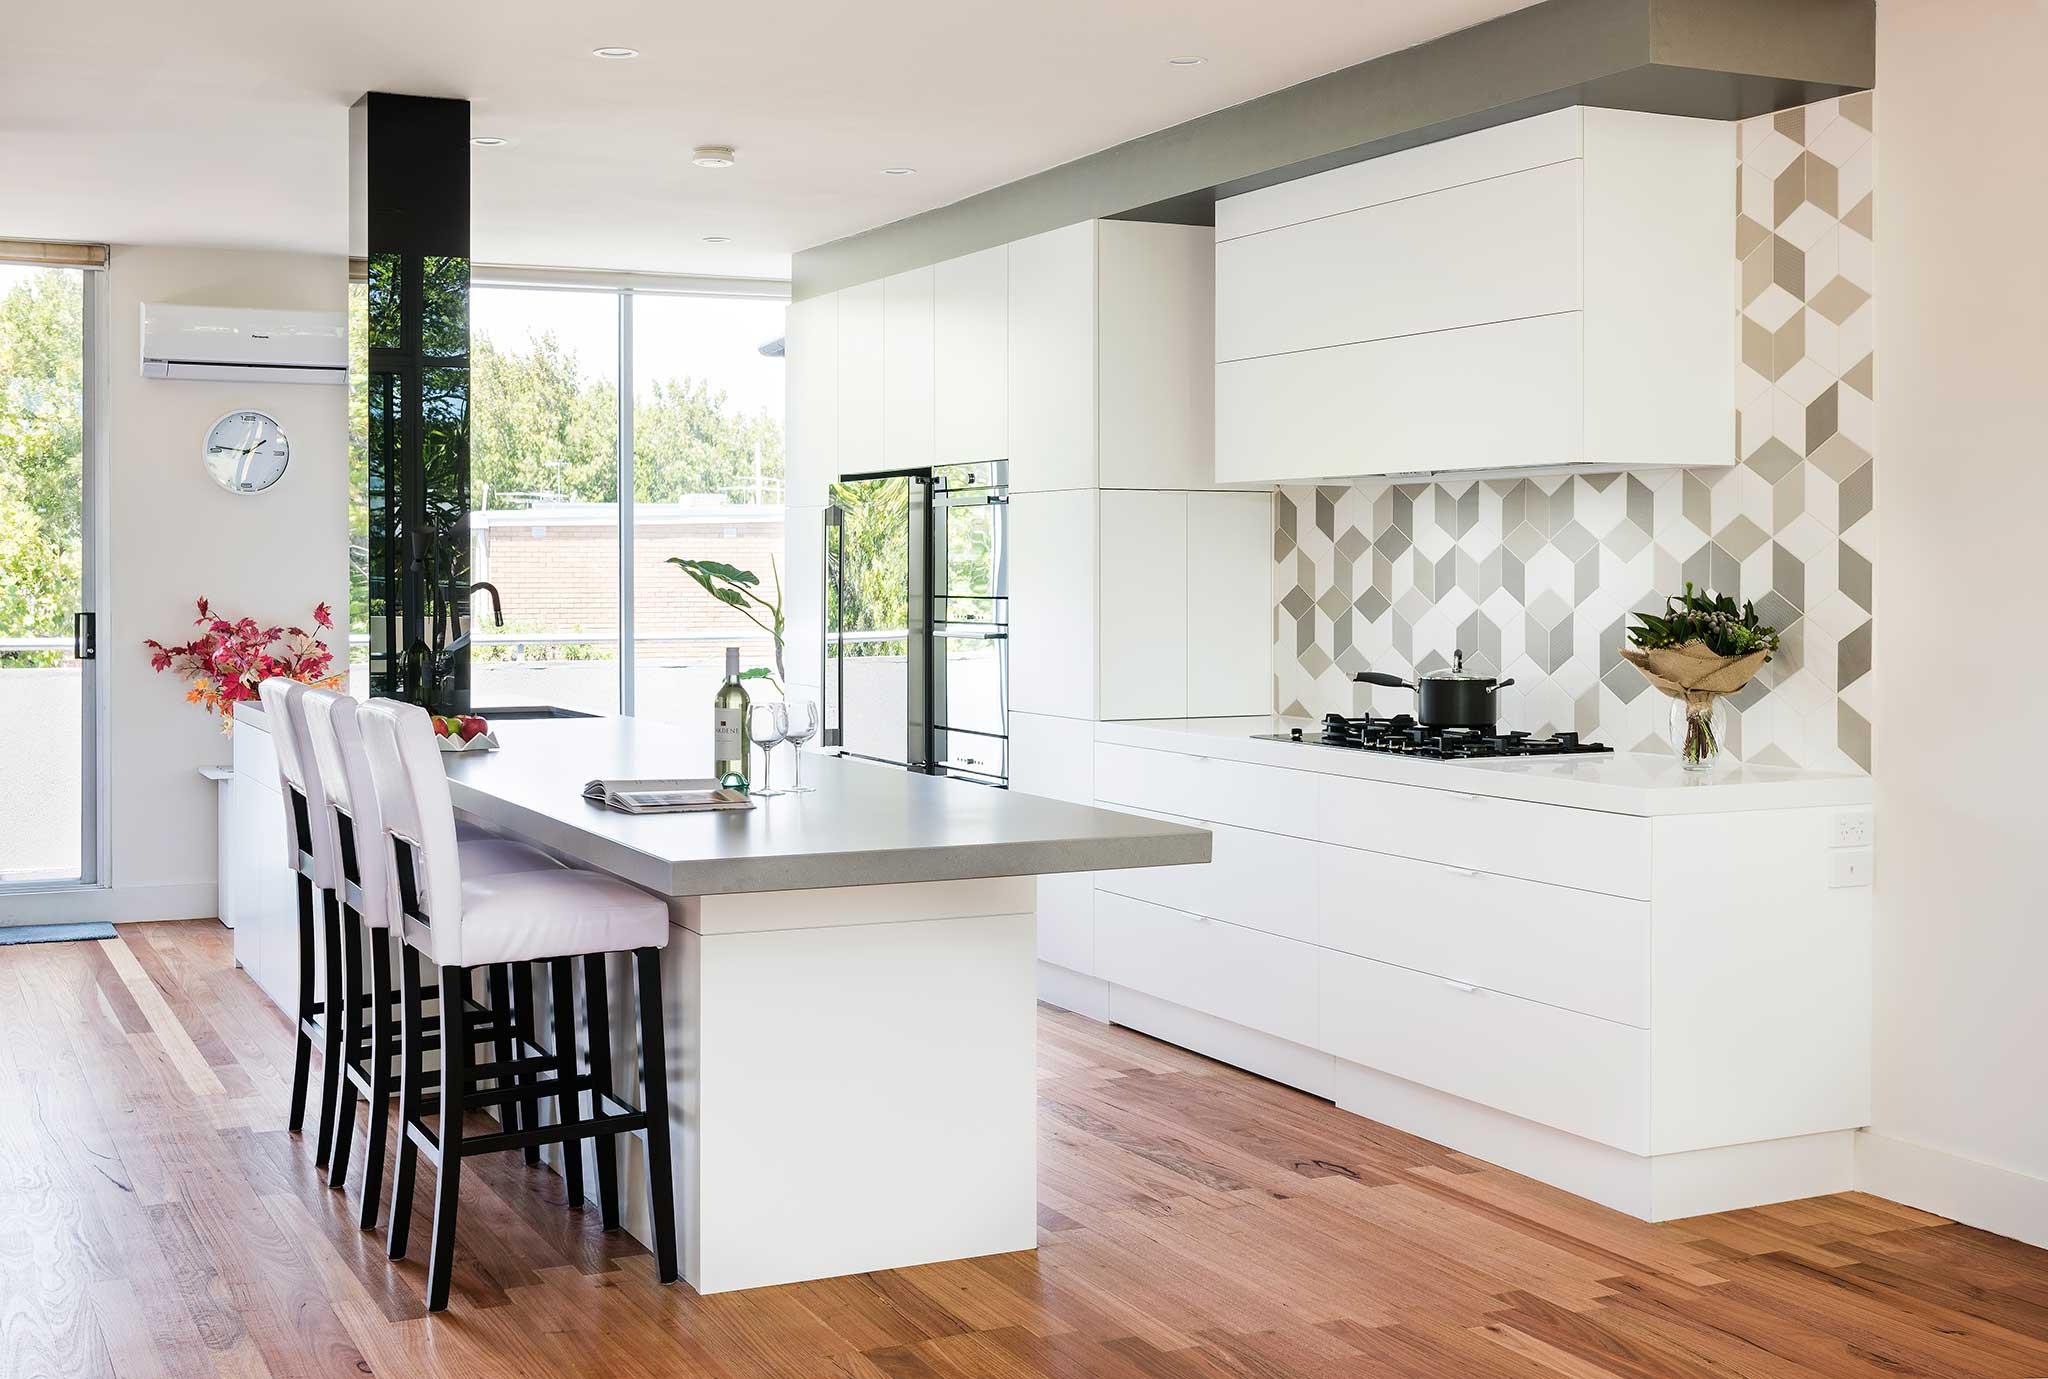 st kilda kitchen rosemount kitchens